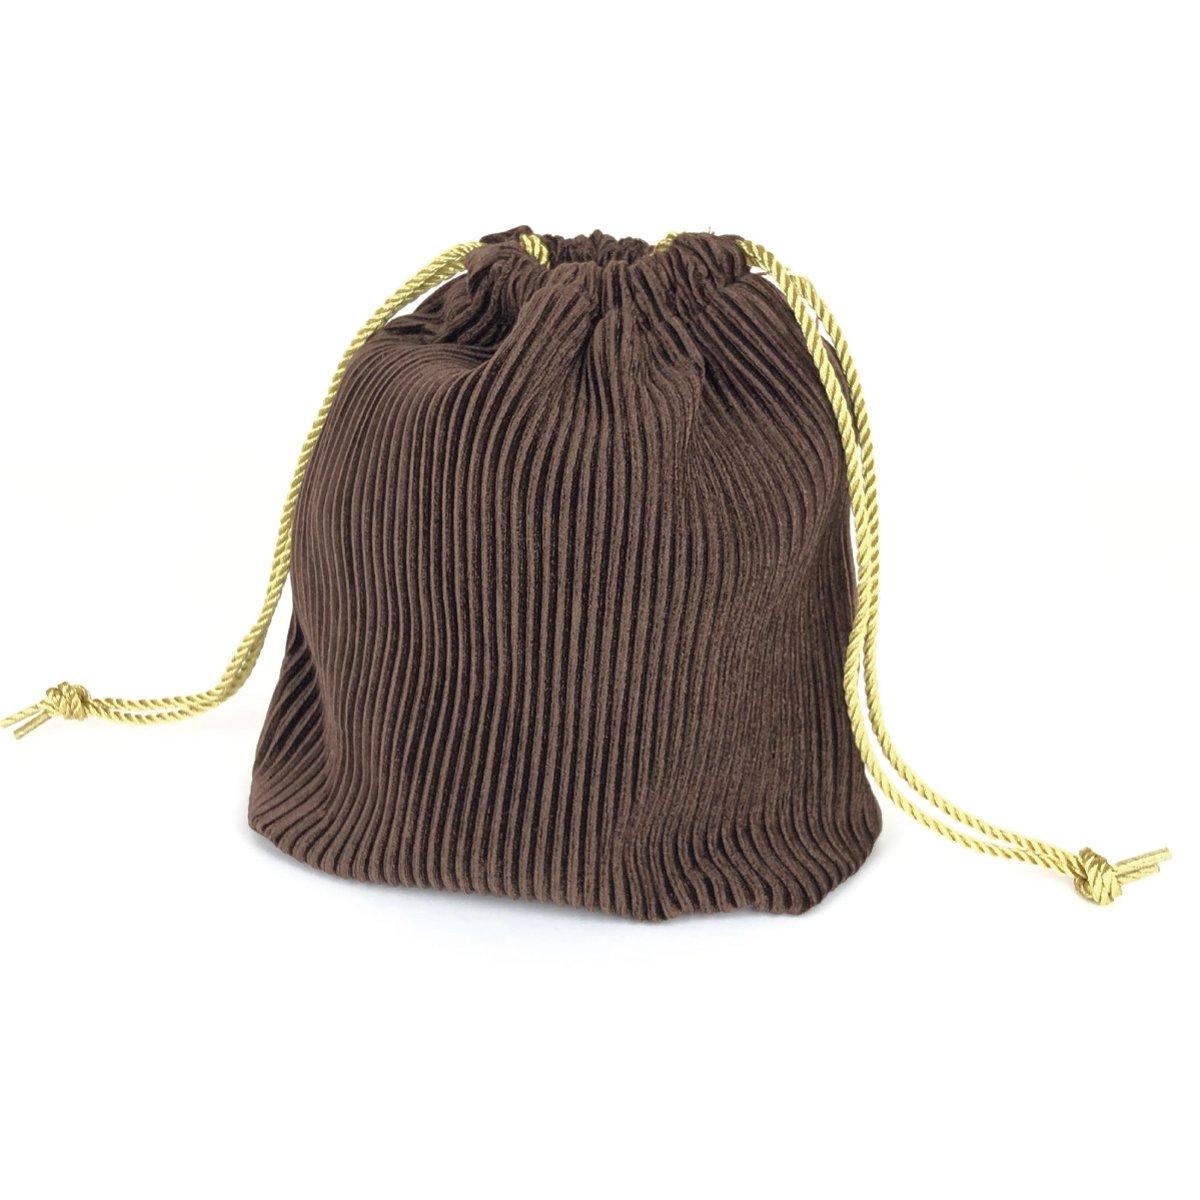 Classy Pleats Bag 詳細画像2